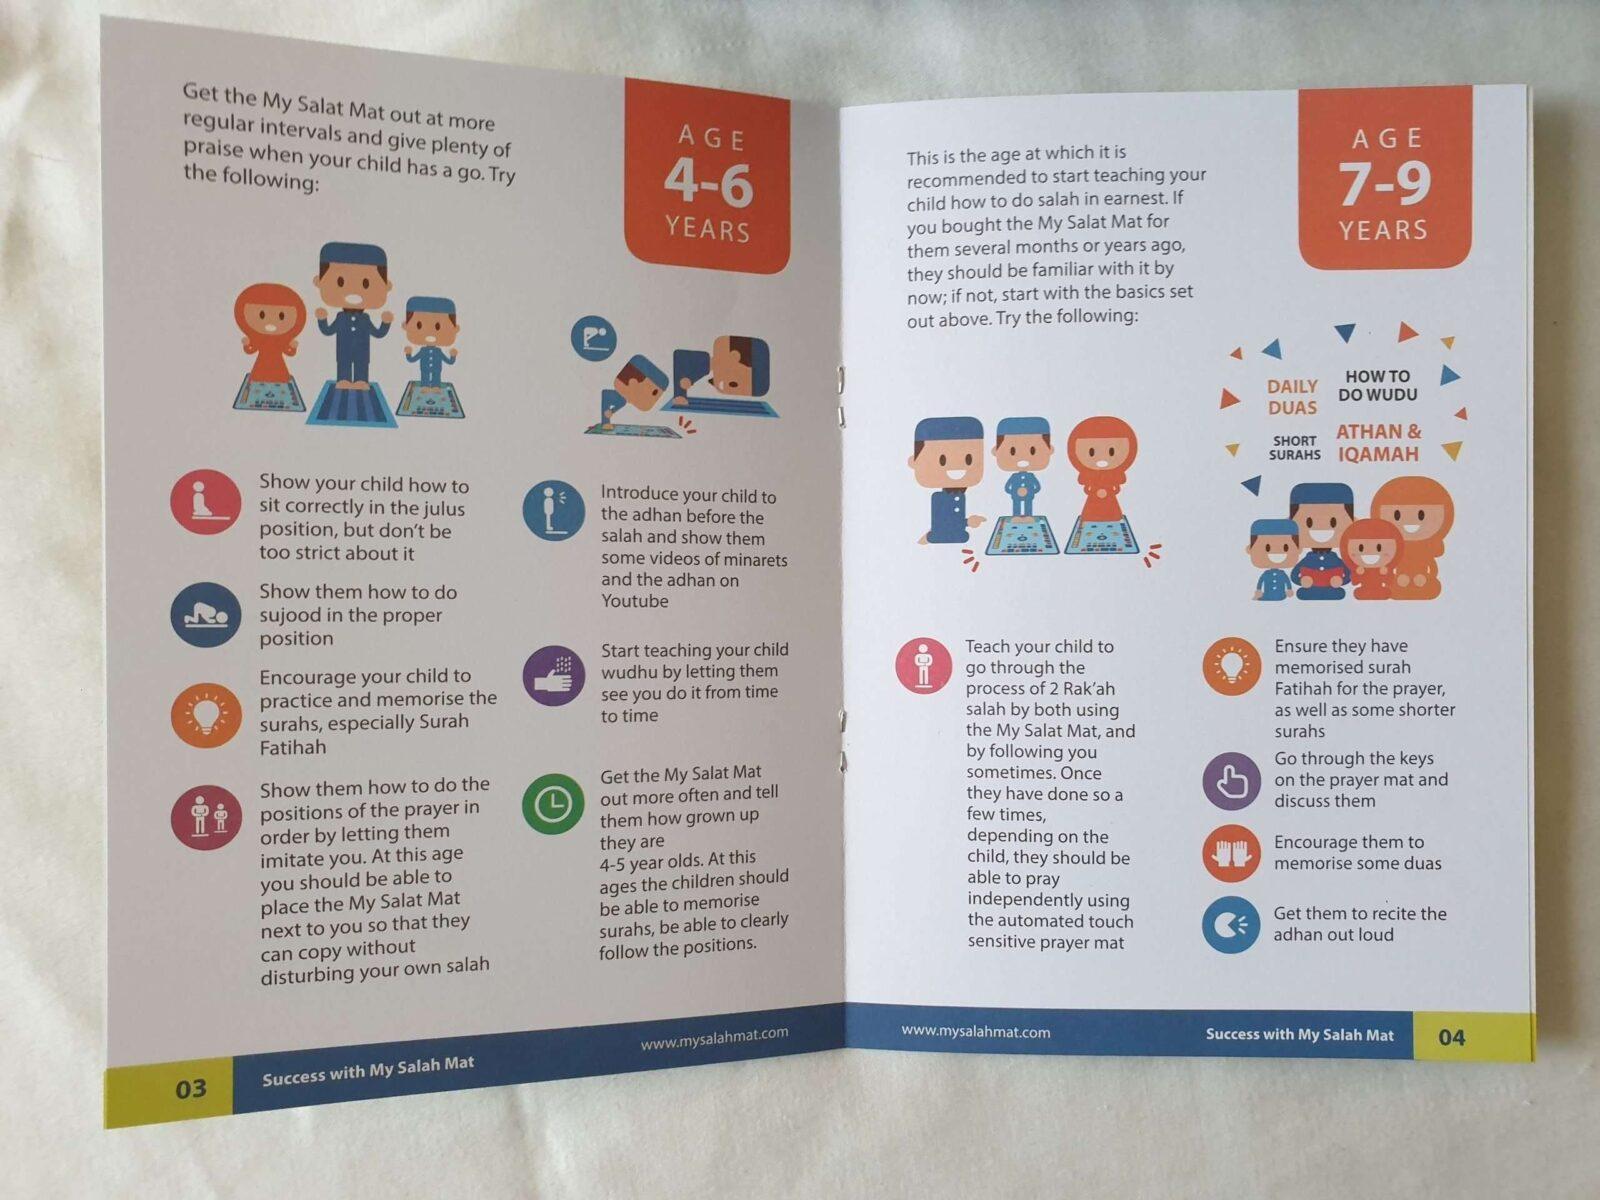 Parental guide book